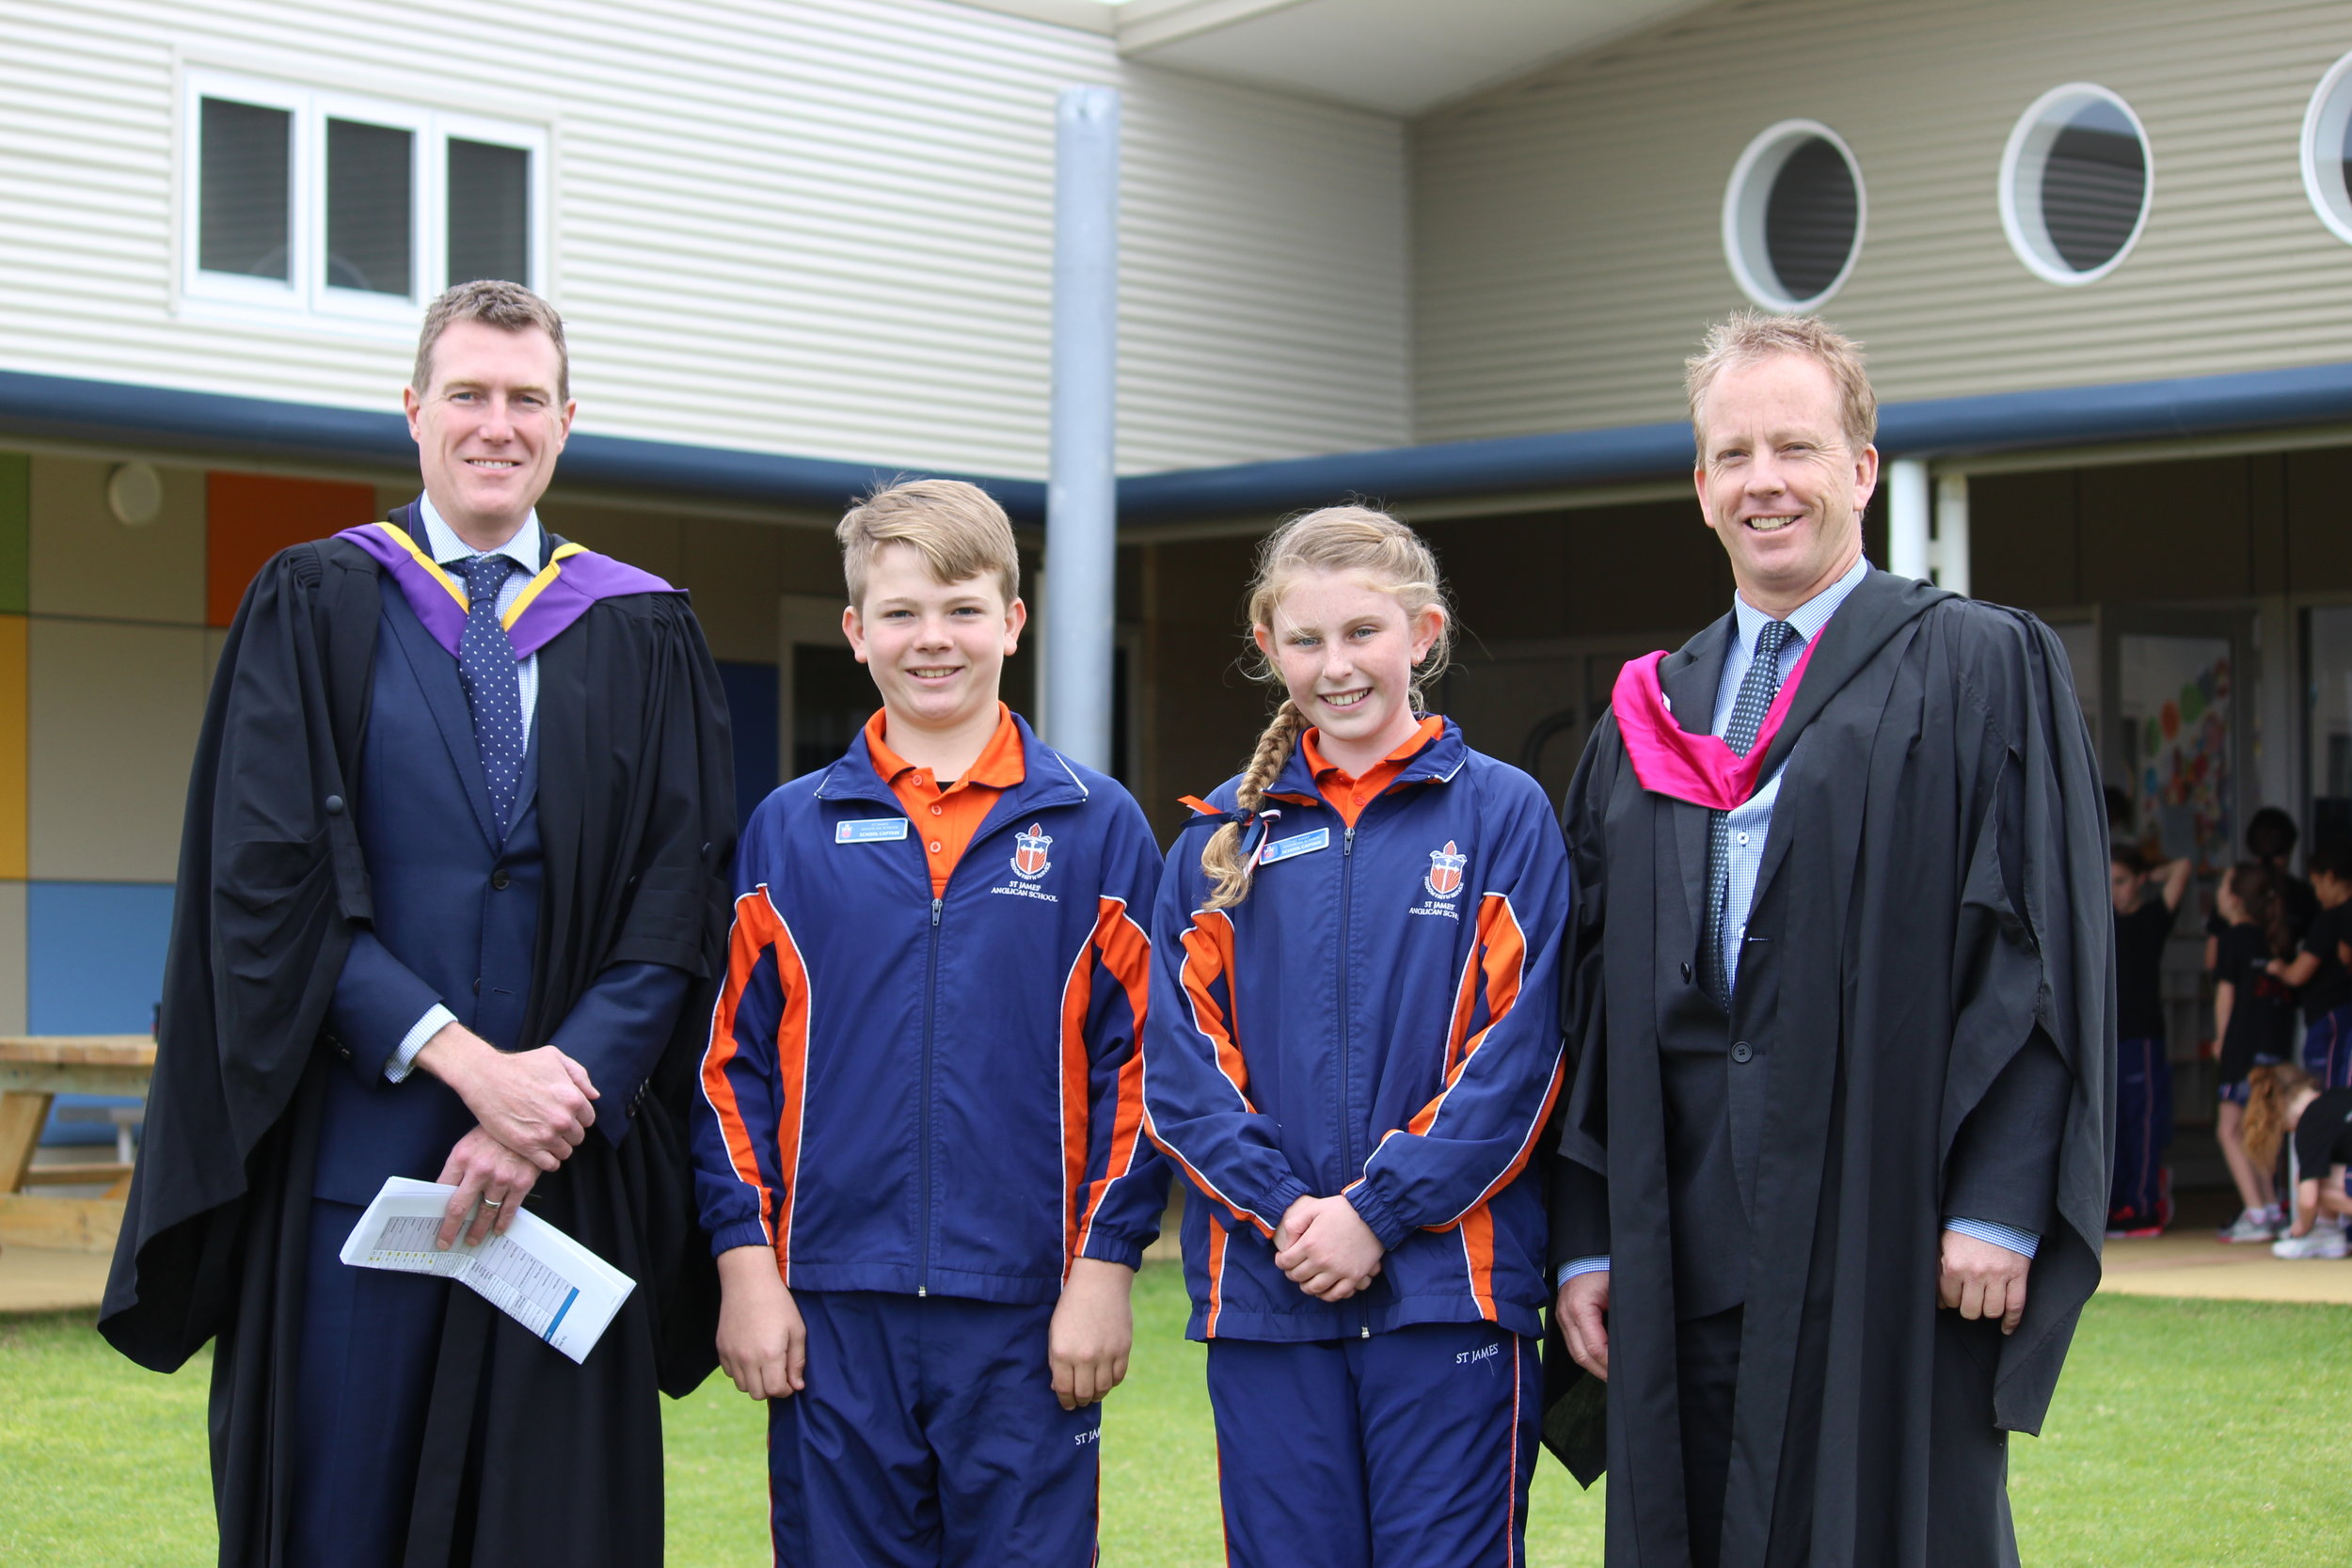 MHR Christian Porter, Isaac Faithful (School Captain), Bridget Leaman (School Captain) and Mr Adrian Pree, Principal of St James' Anglican School